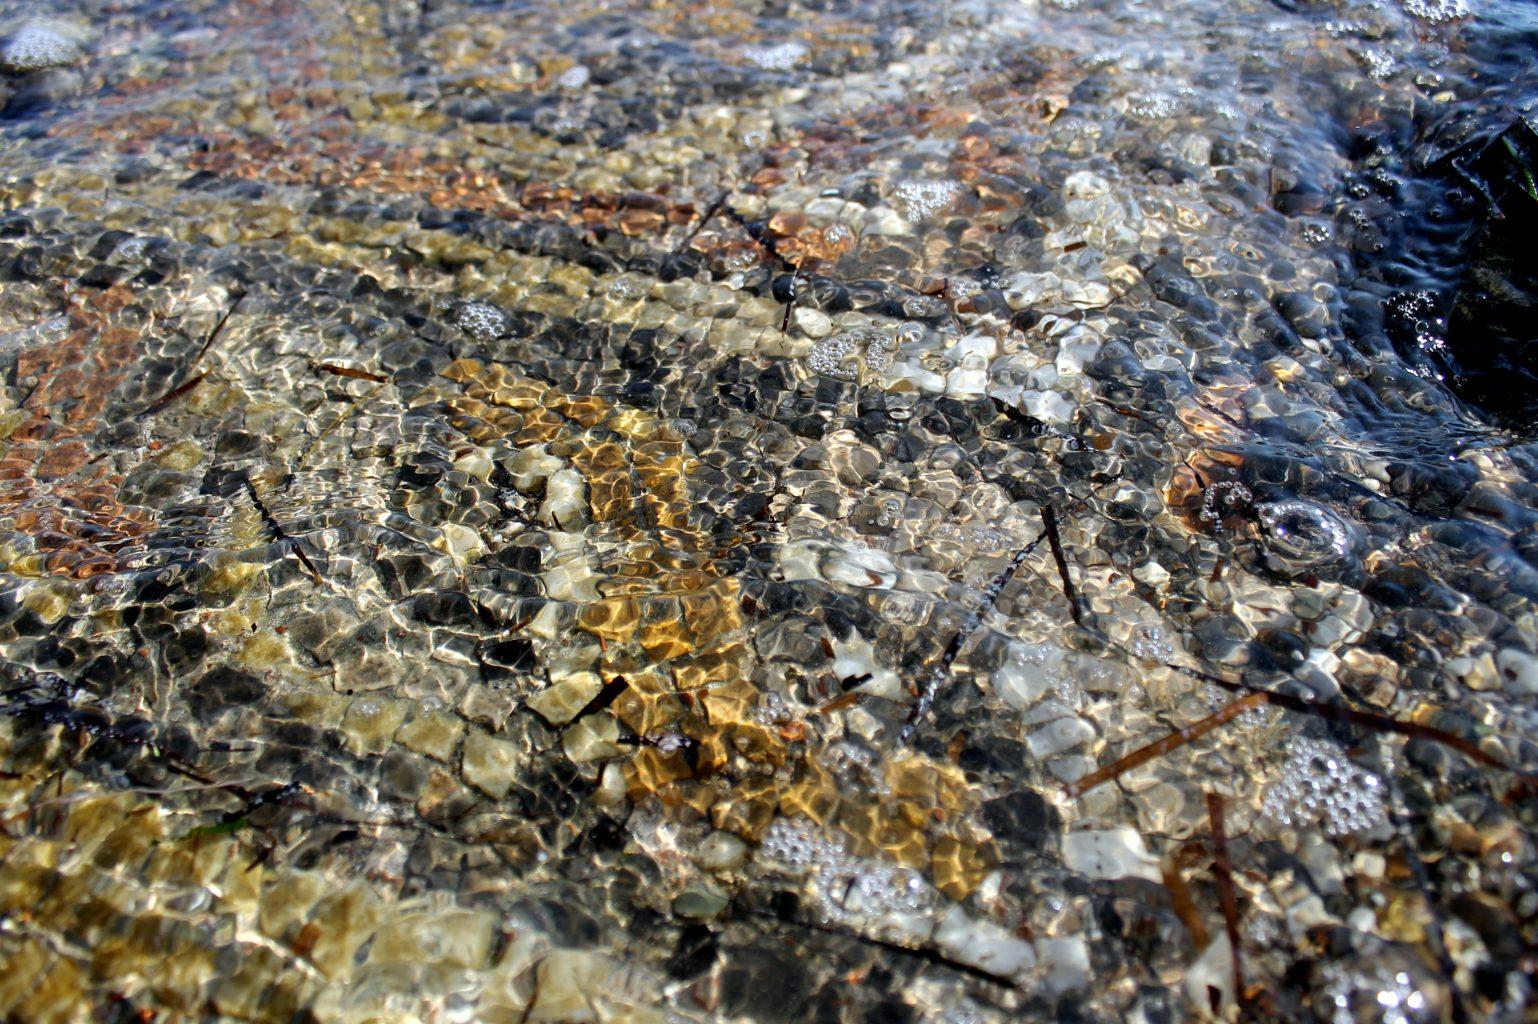 Ancient mosaic fragments in the sea, Atalanti, Greece.